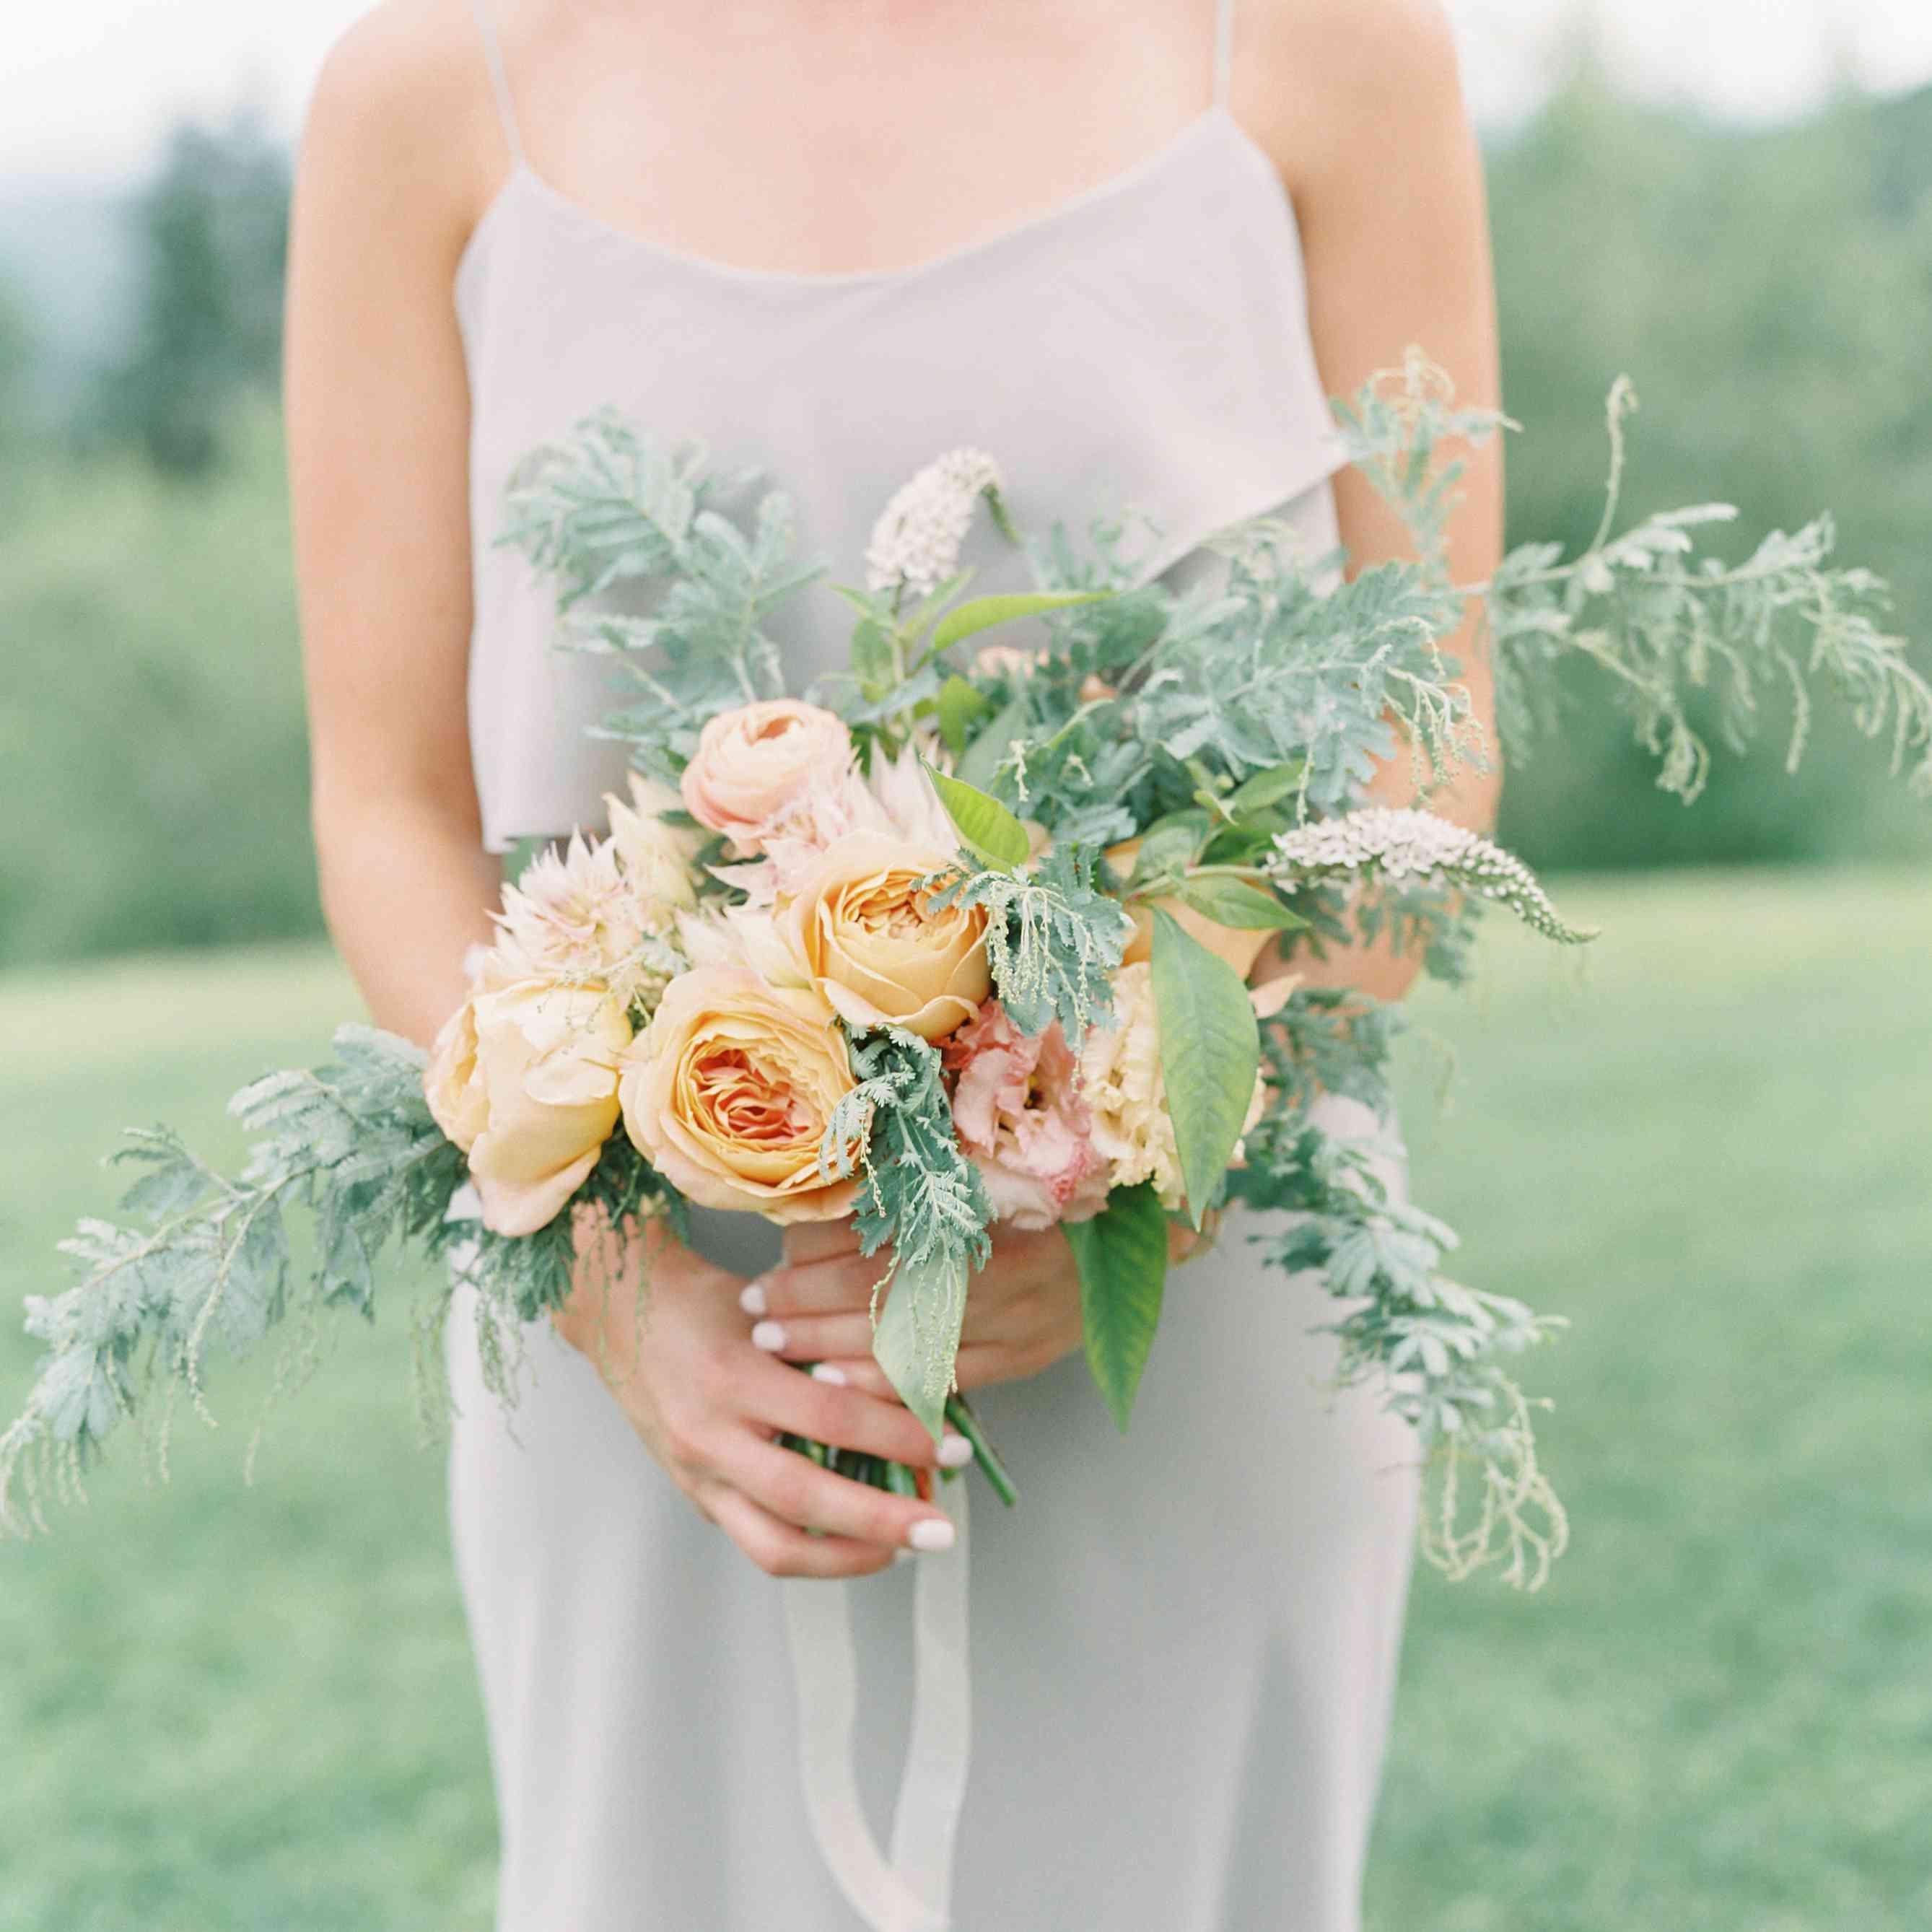 Summer Wedding Ideas: 10 Lush Summer Wedding Flower Ideas